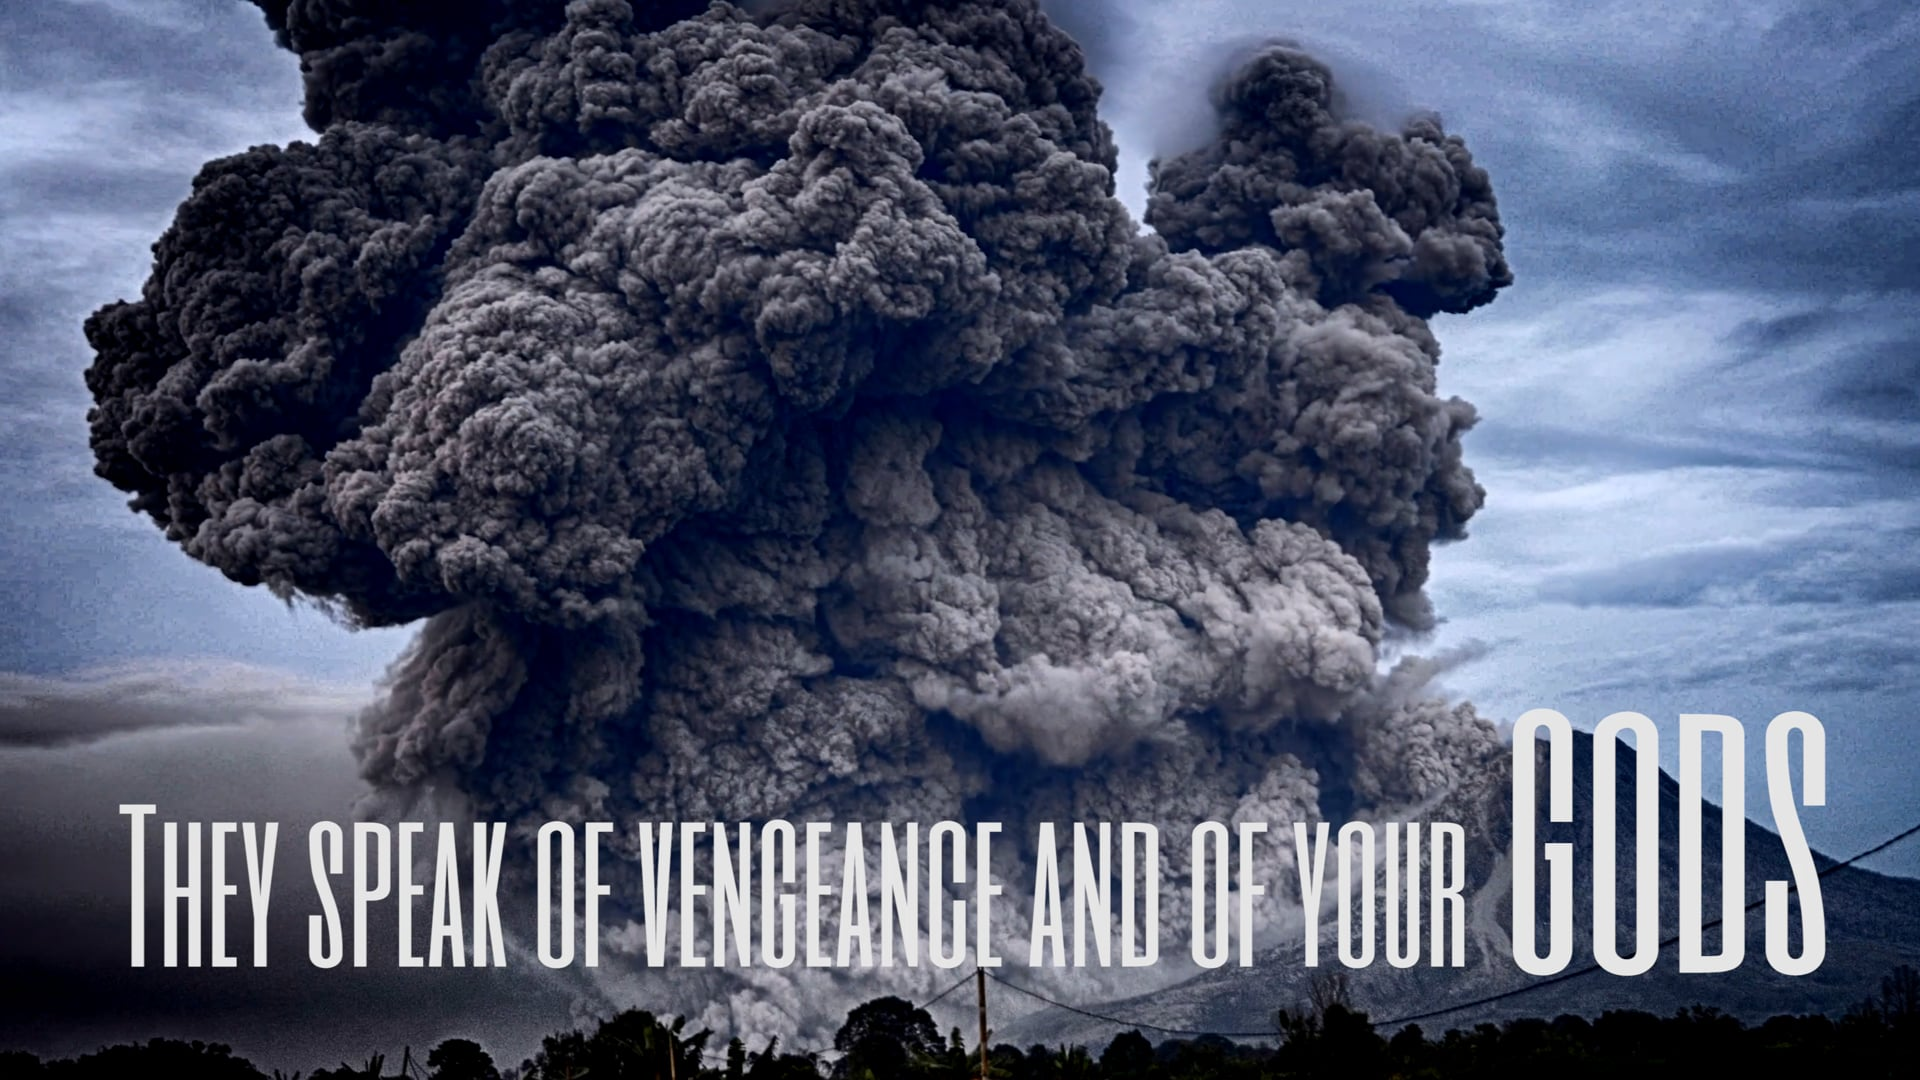 """Nightmare"" by Venom - Cover by Desmond Tolhurst"